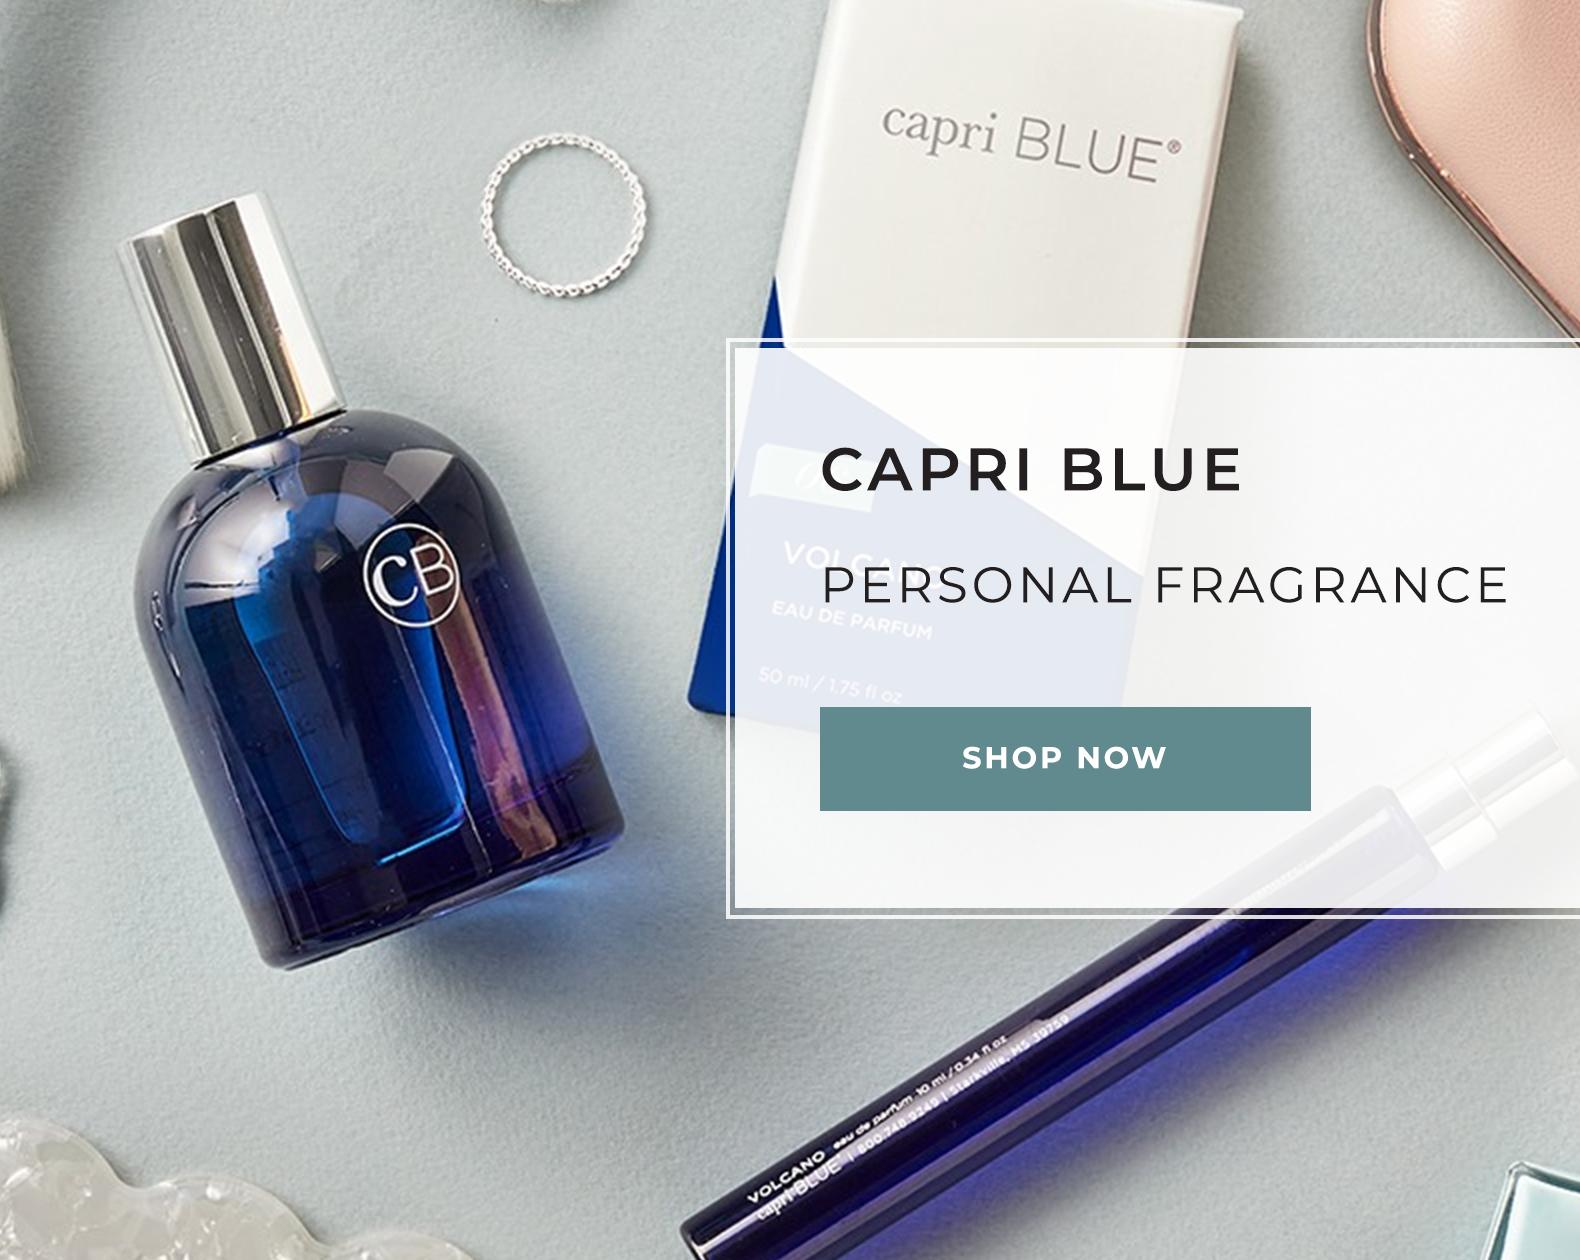 Capri Blue - Personal Fragrance